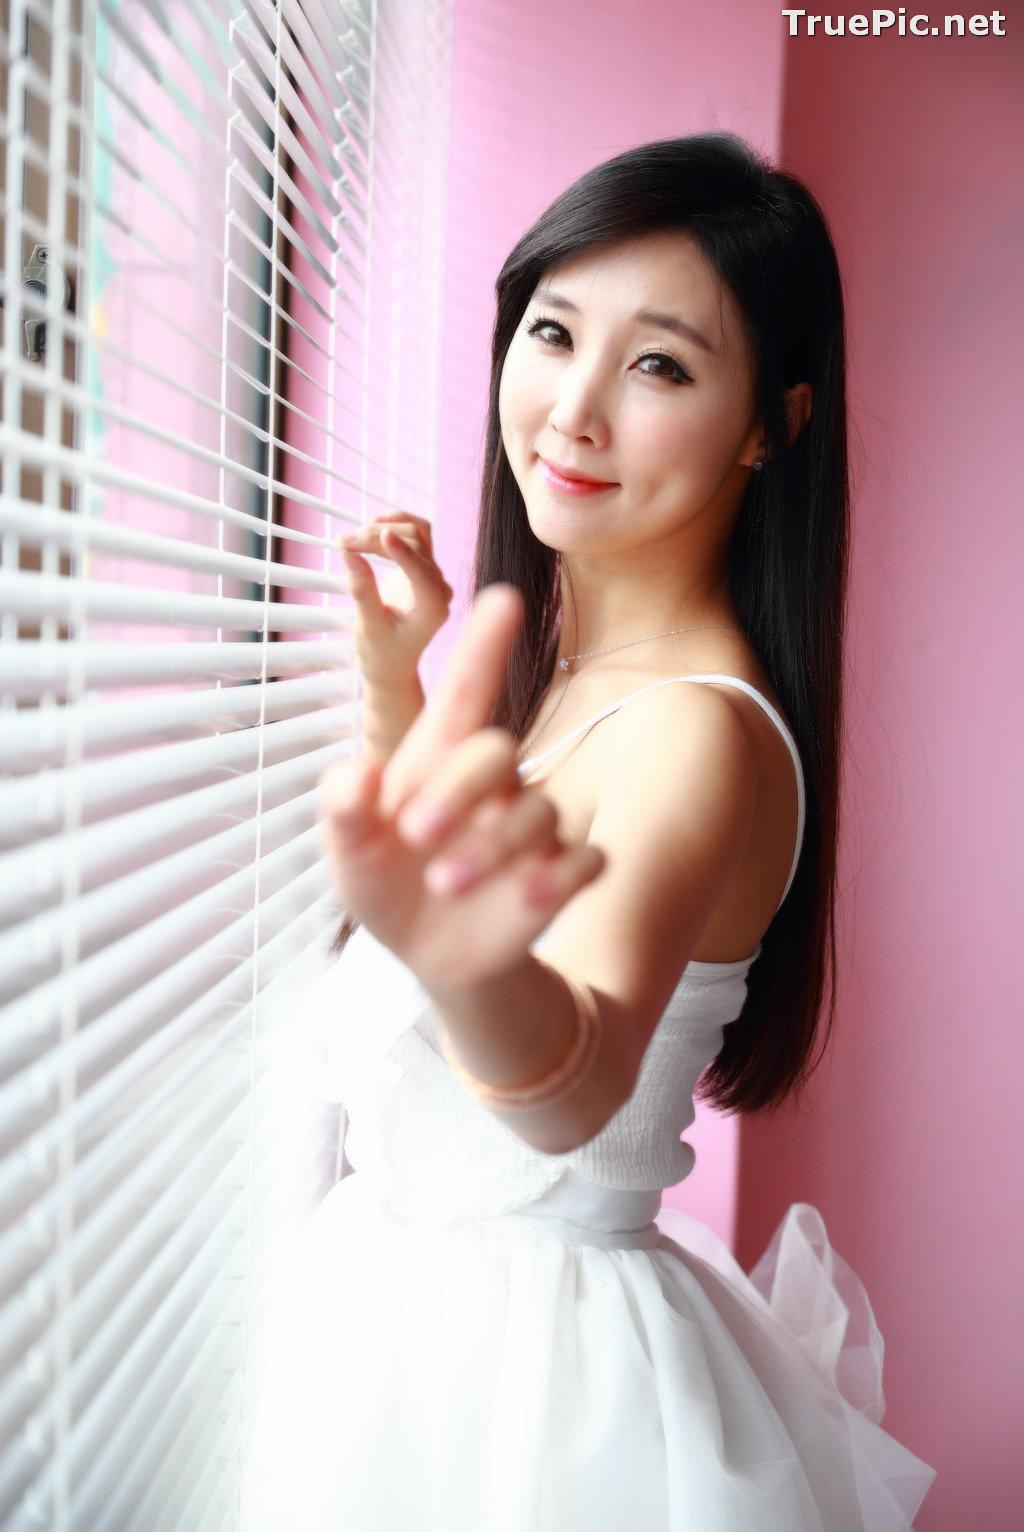 Image Korean Model - Lee Yoo Eun - Studio Photo Collection - TruePic.net - Picture-7